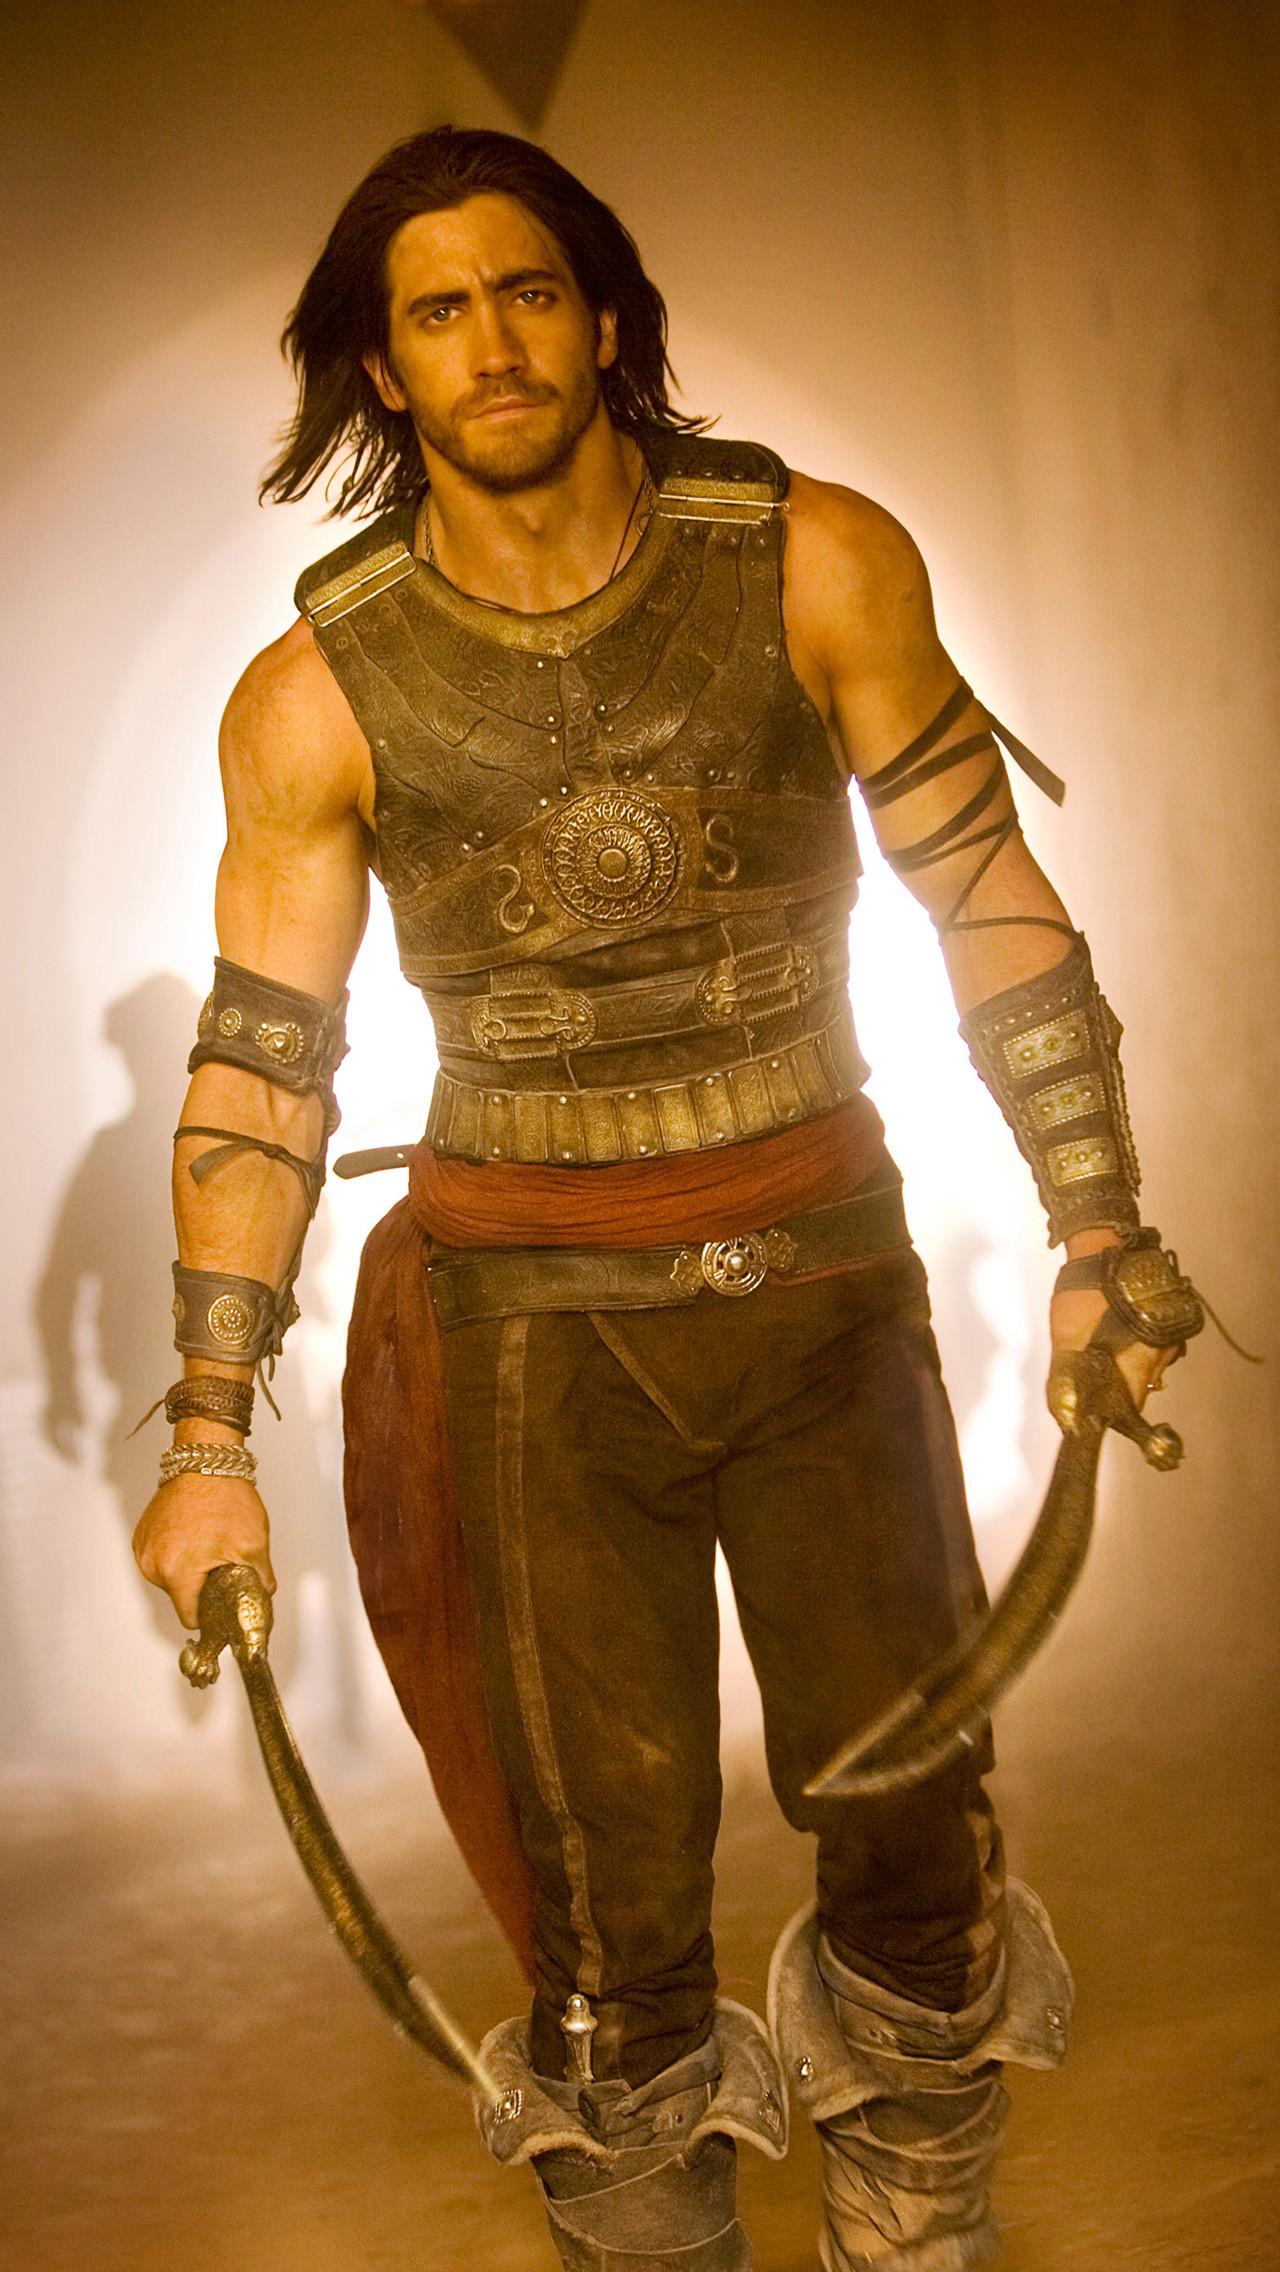 «Принц Персии» (2010) – по игре Prince of Persia: The Sands of Time